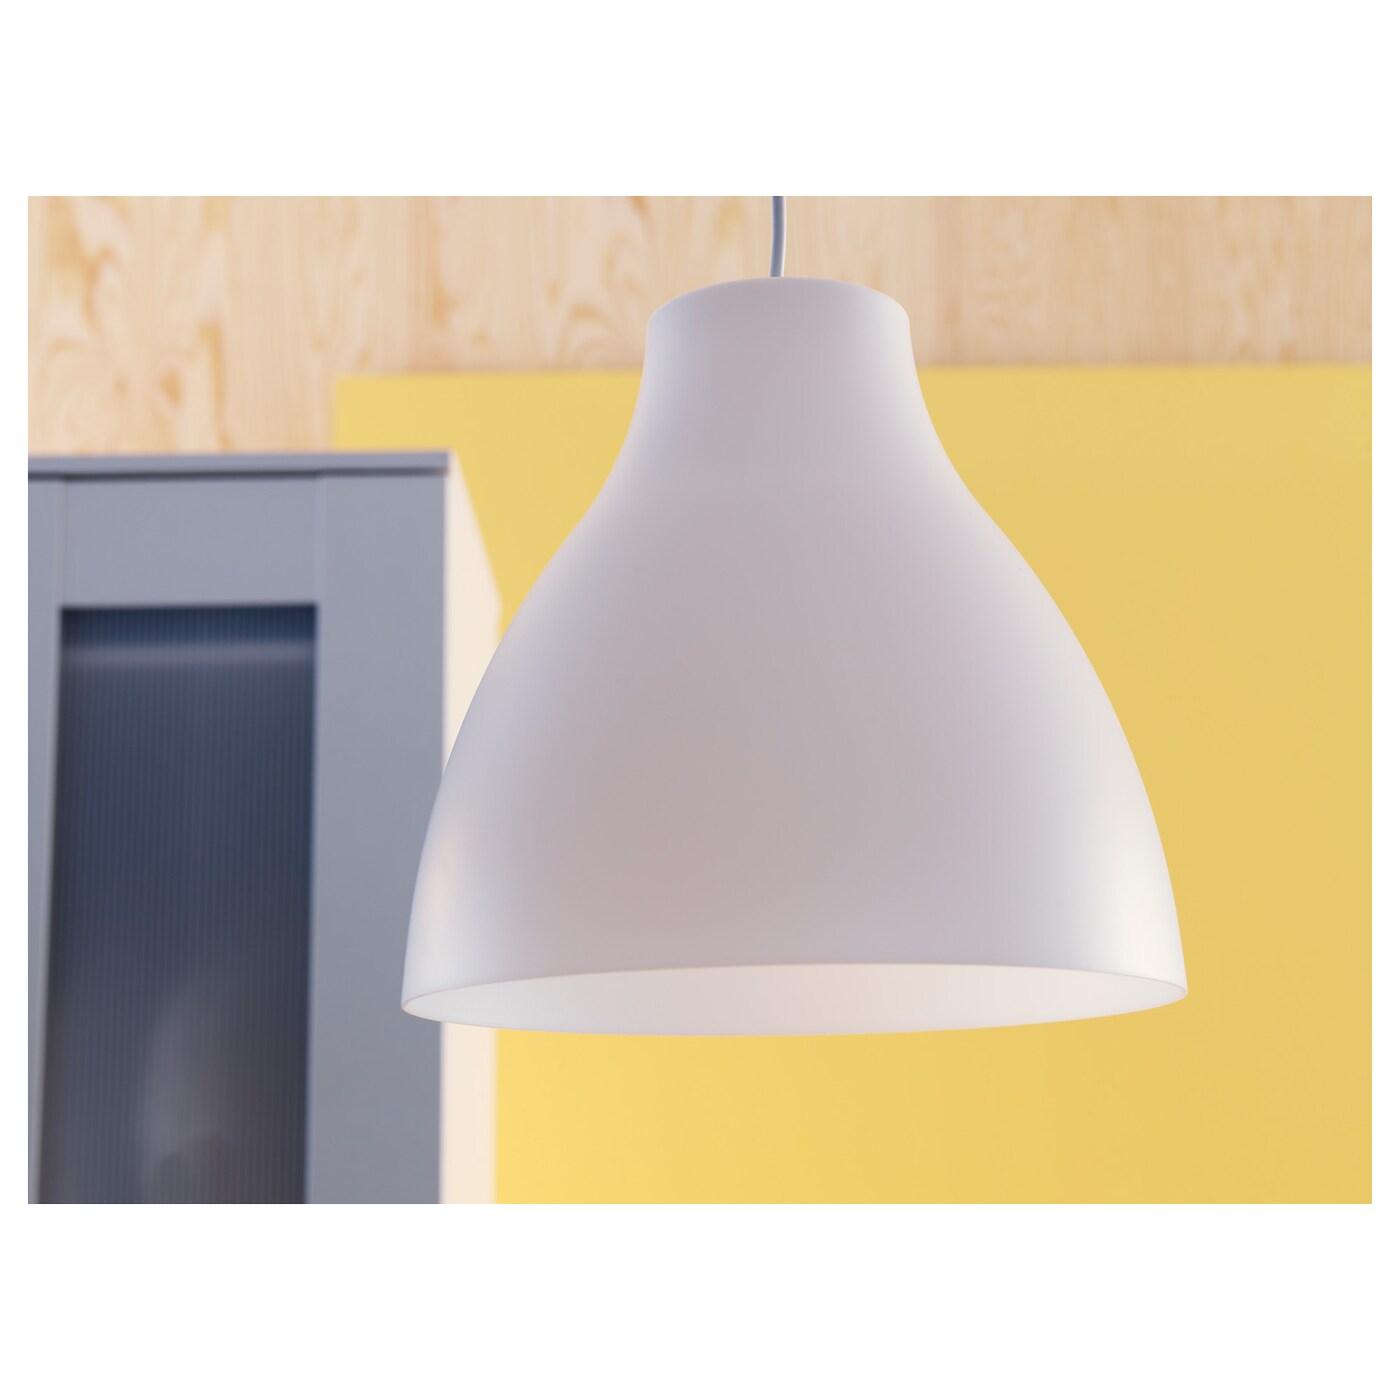 MELODI Pendant lamp 28 cm  IKEA